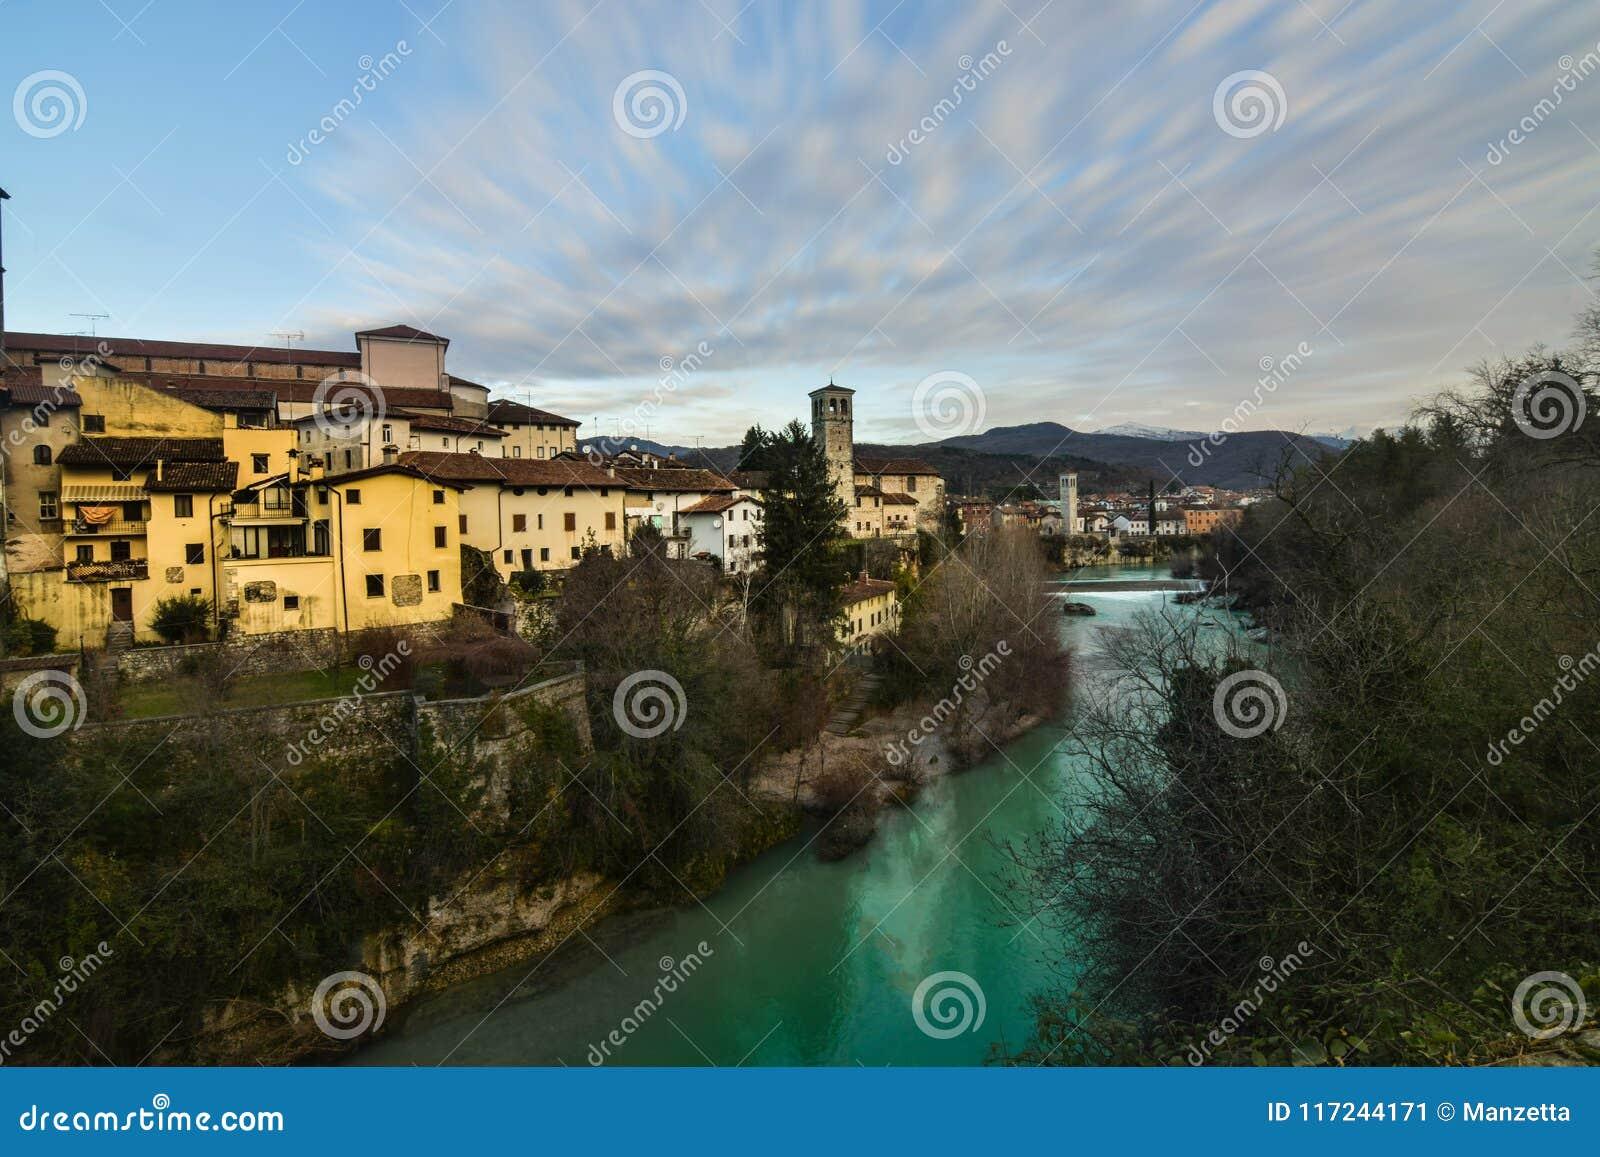 Une vue de Cividale del Friuli, Italie